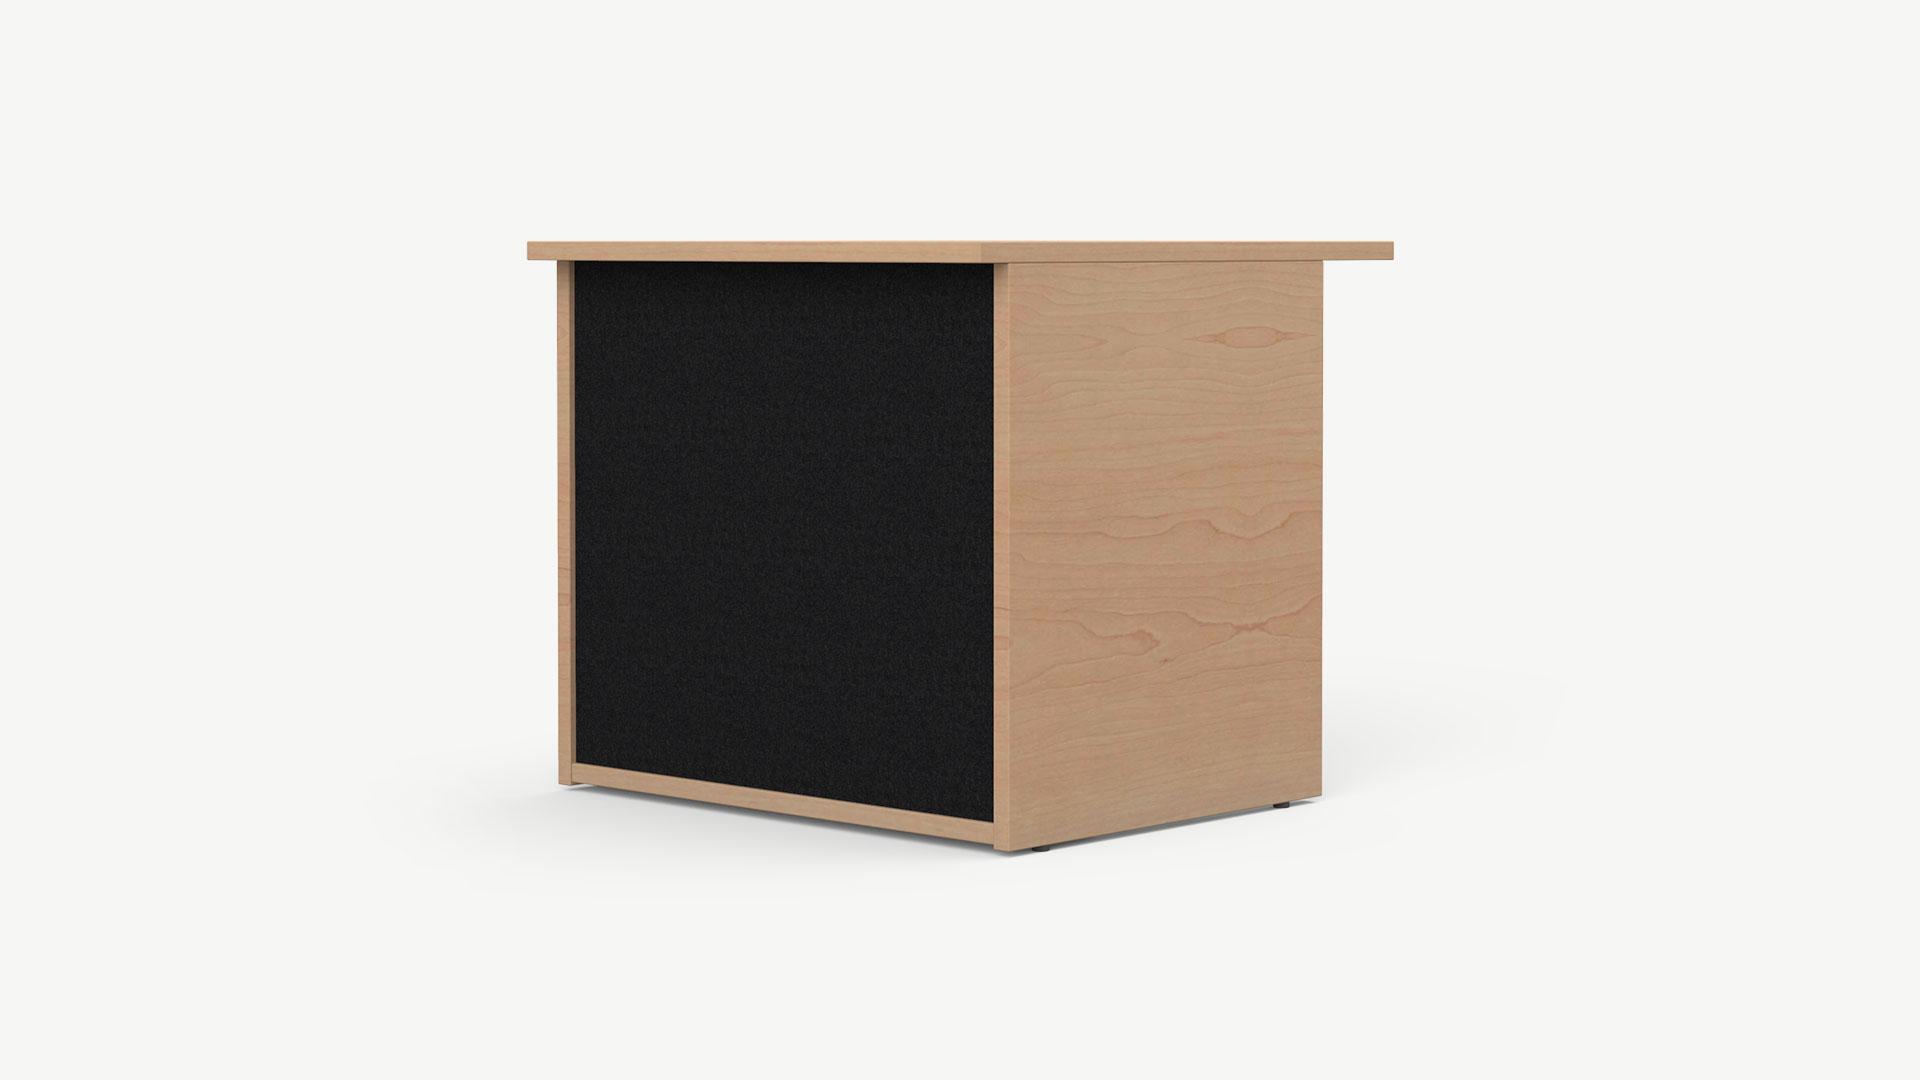 Nowy Styl niedrige Theke Velum, rechteckige Tischplatte